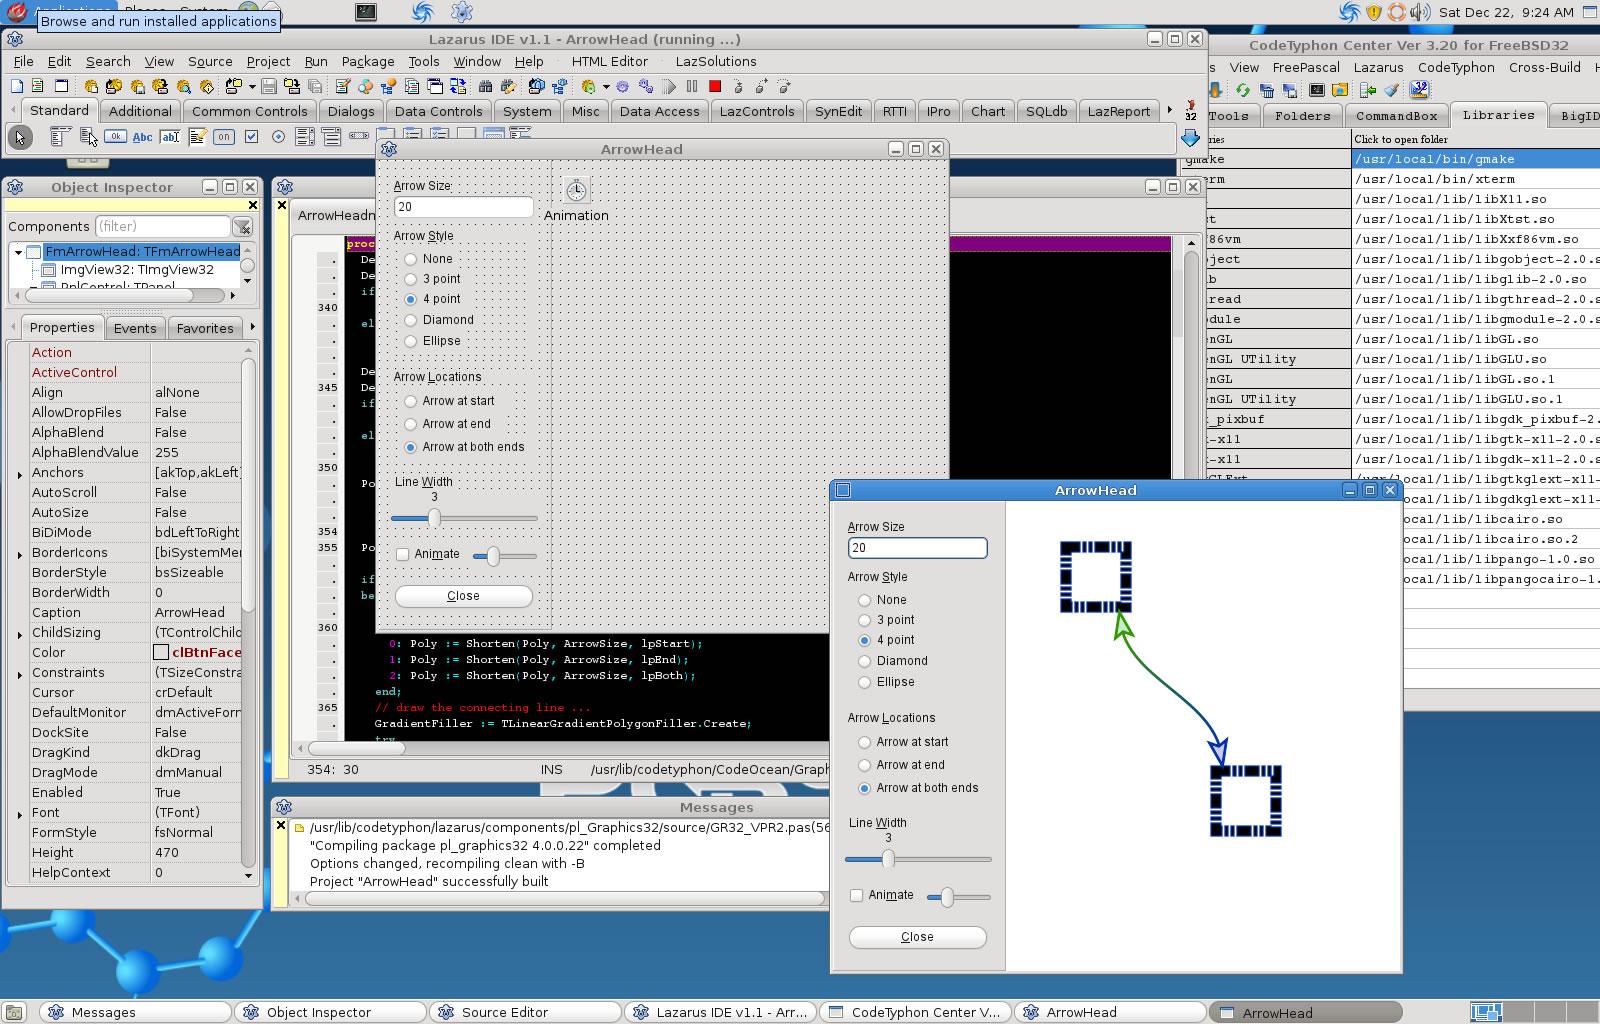 PCBSD32-3.jpg